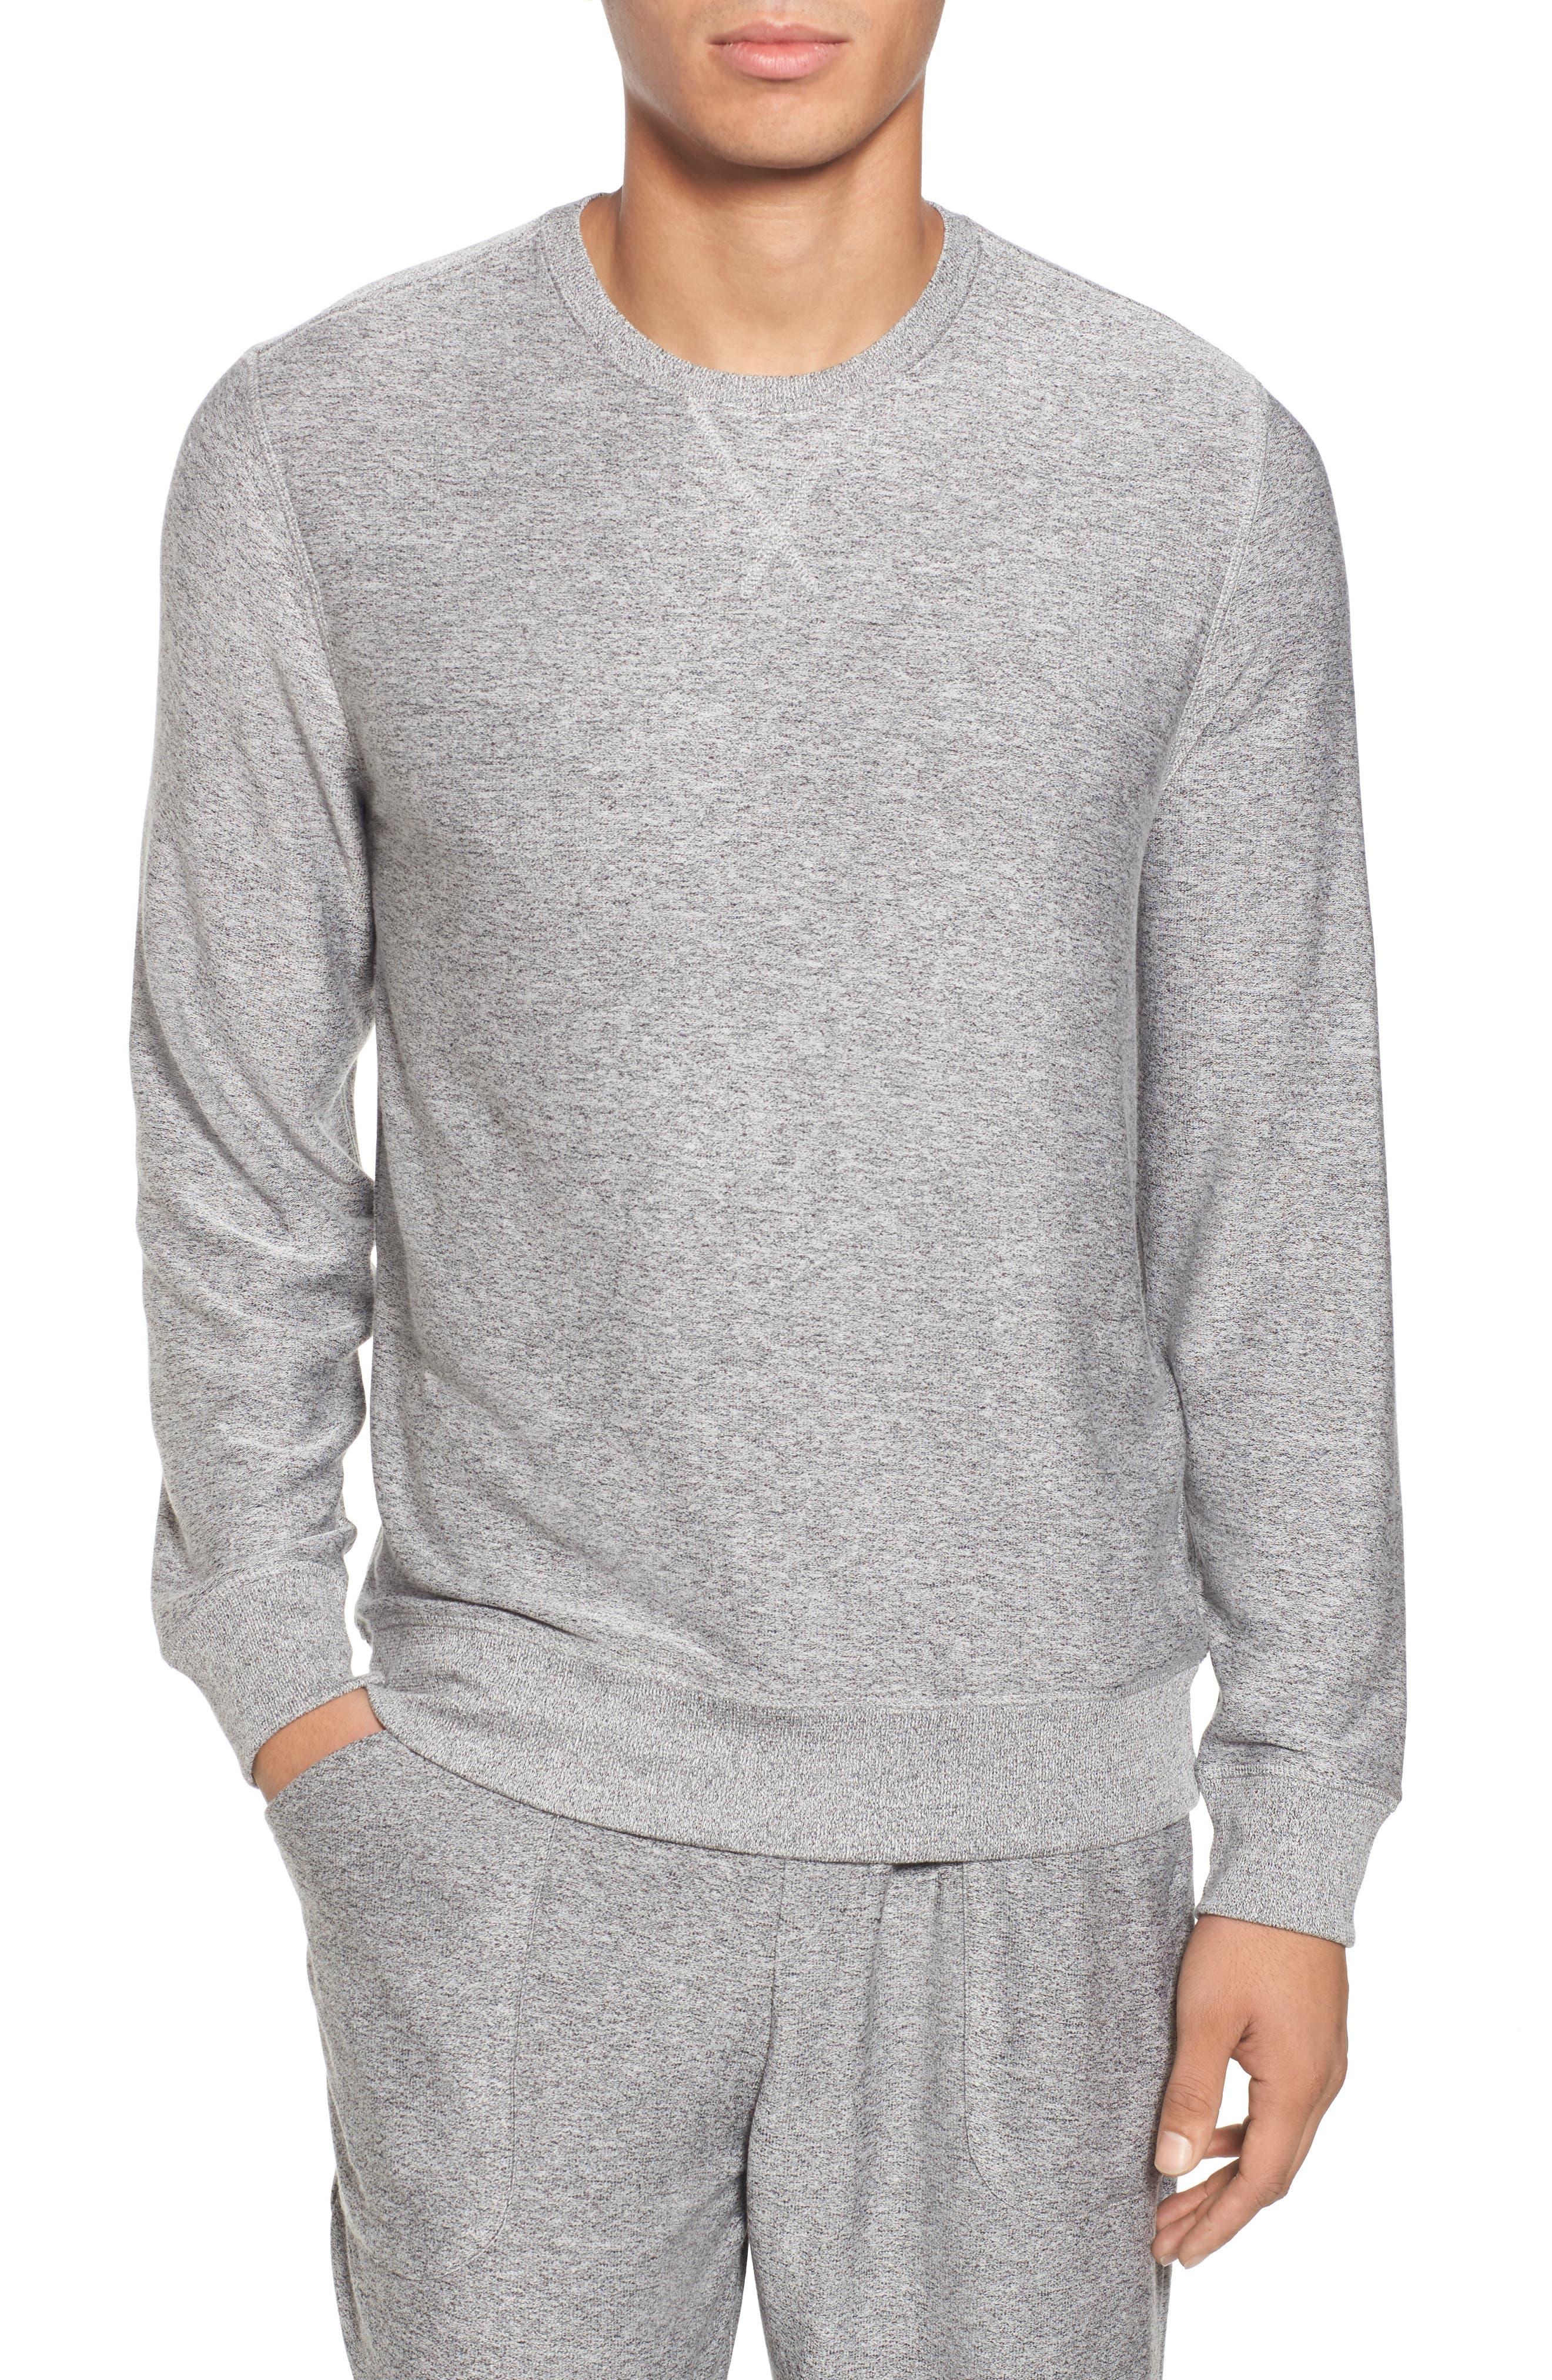 Nordstrom Shop Ultra Soft Crewneck Sweatshirt, Grey